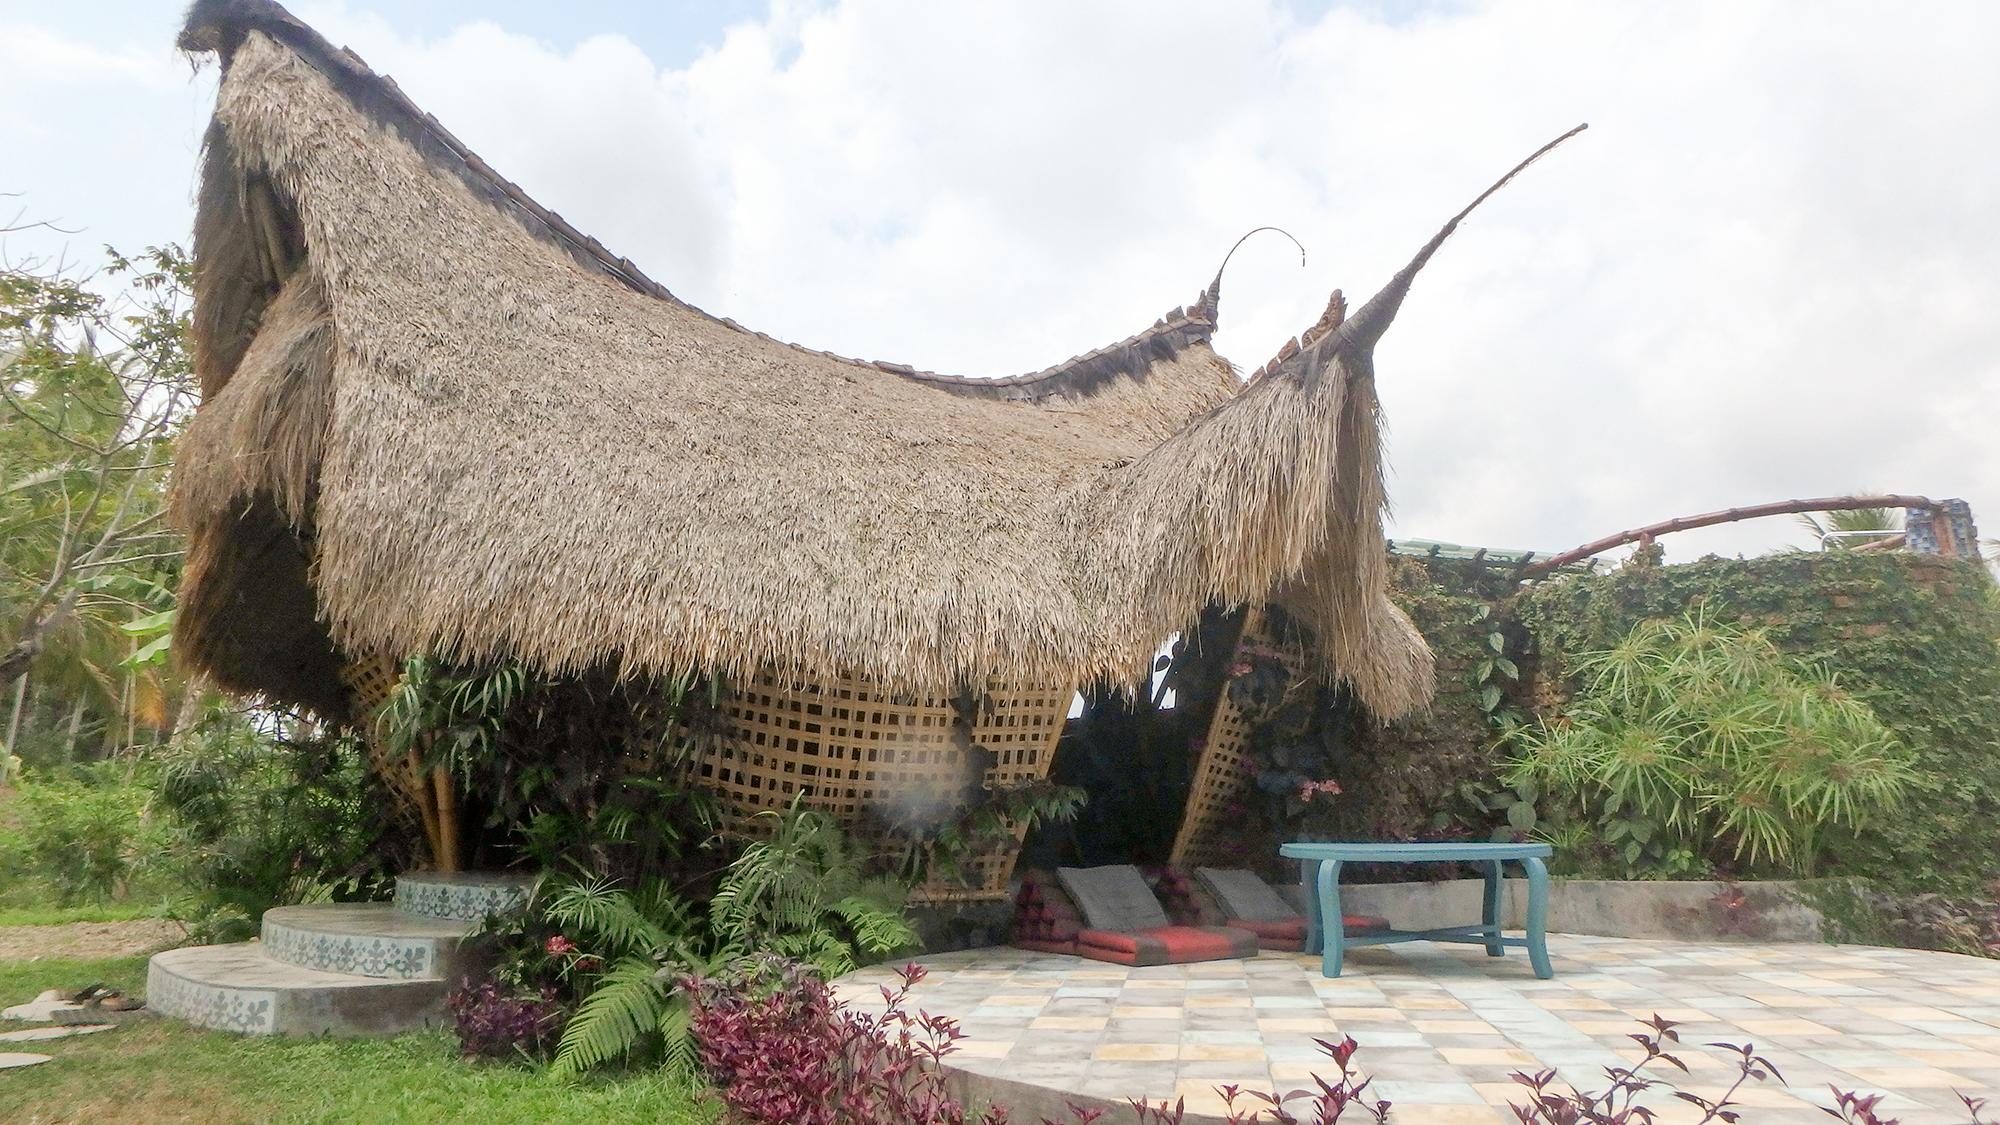 bamboo eco hut